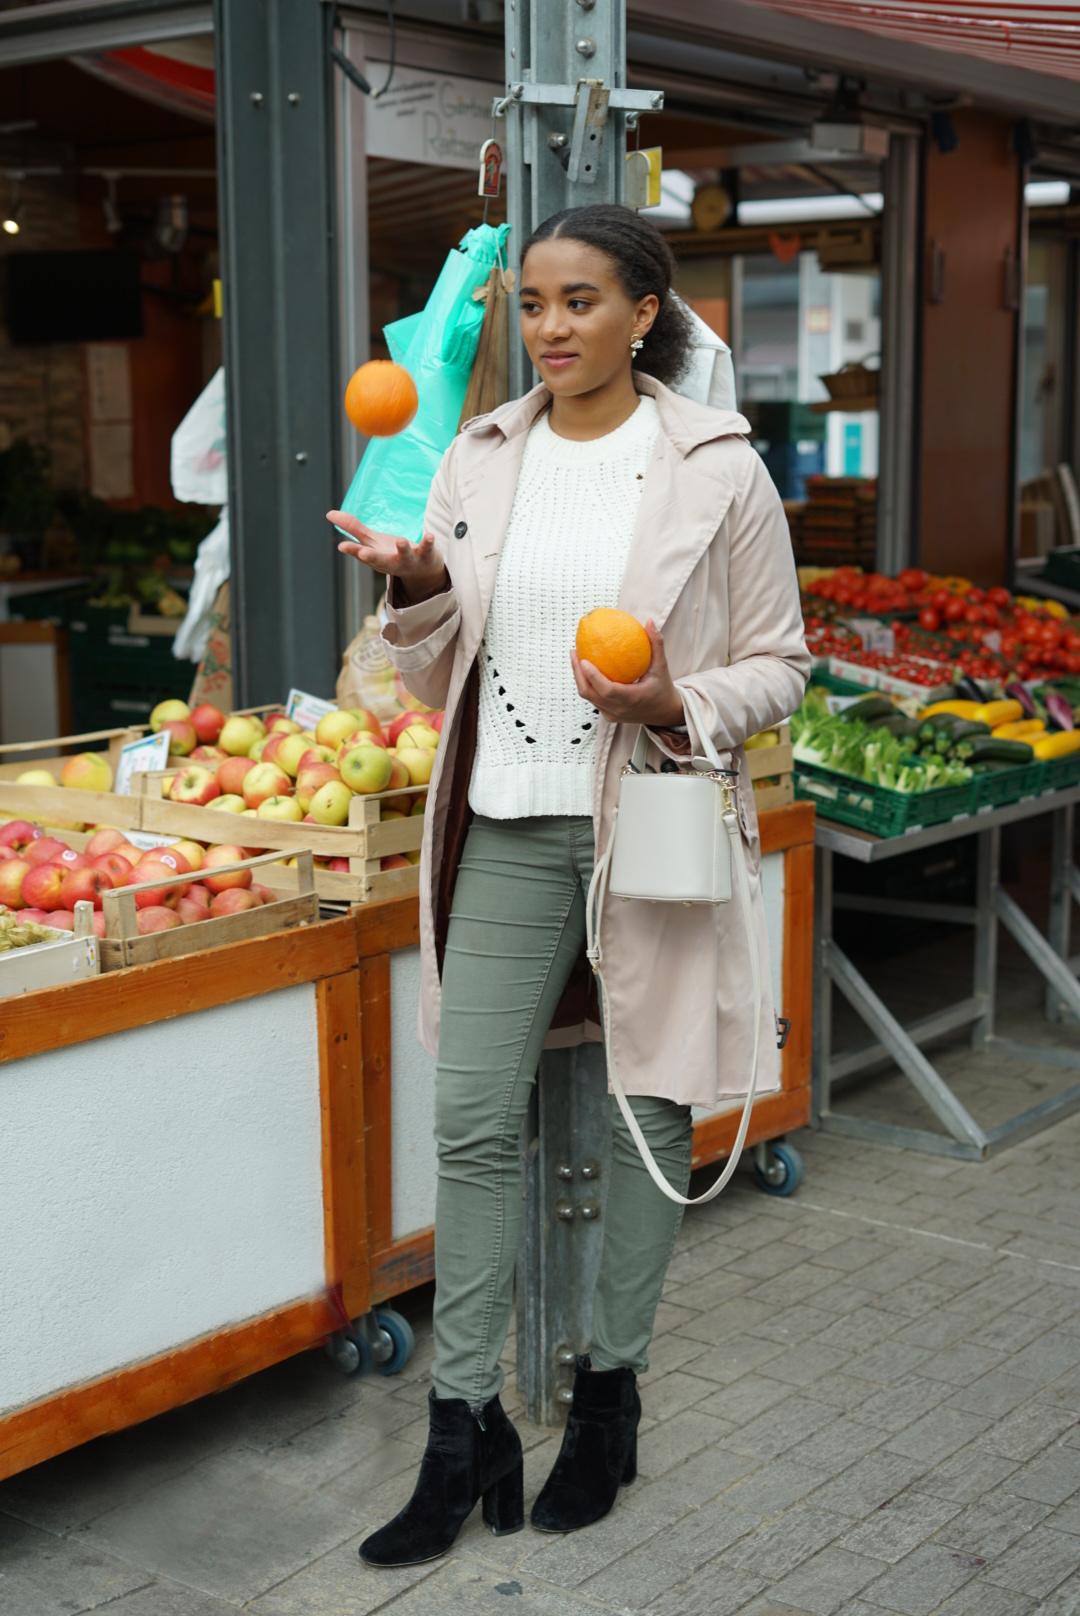 mini bag girl market trench coat